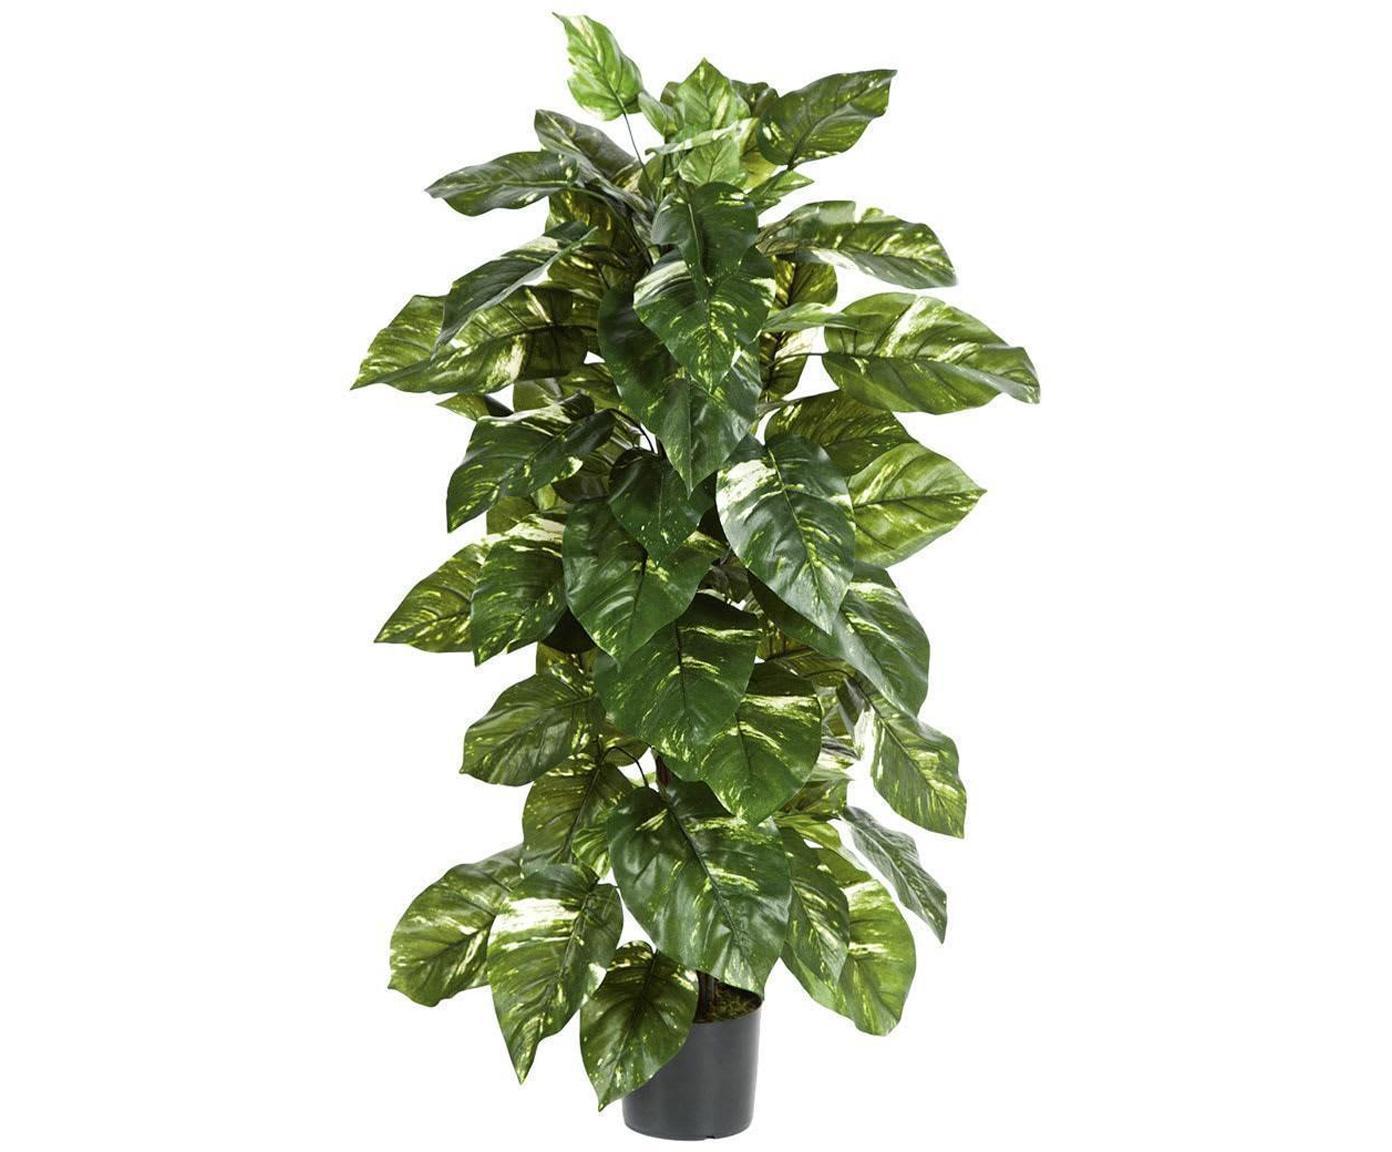 Planta artificial Potus, Poliéster, Látex, Polipropileno, Alambre de metal, Natural, Ø 40 x Al 120 cm